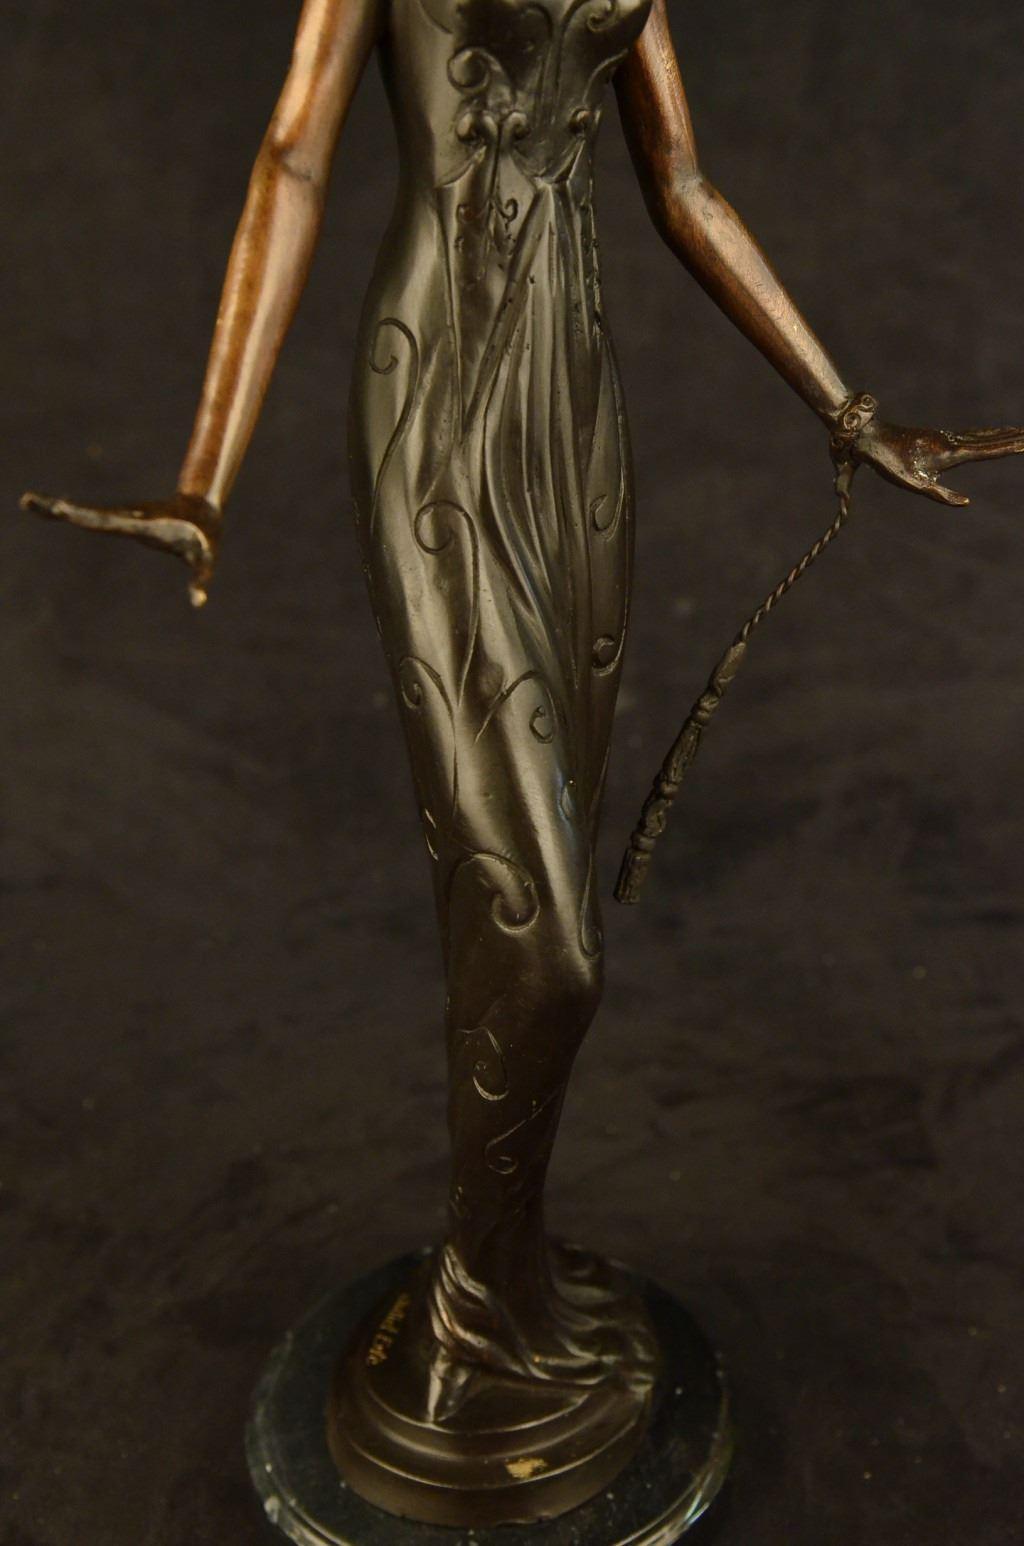 Art Deco Vintage Theater Jazz Singer Actress Dancer Bronze Marble Statue Artwork